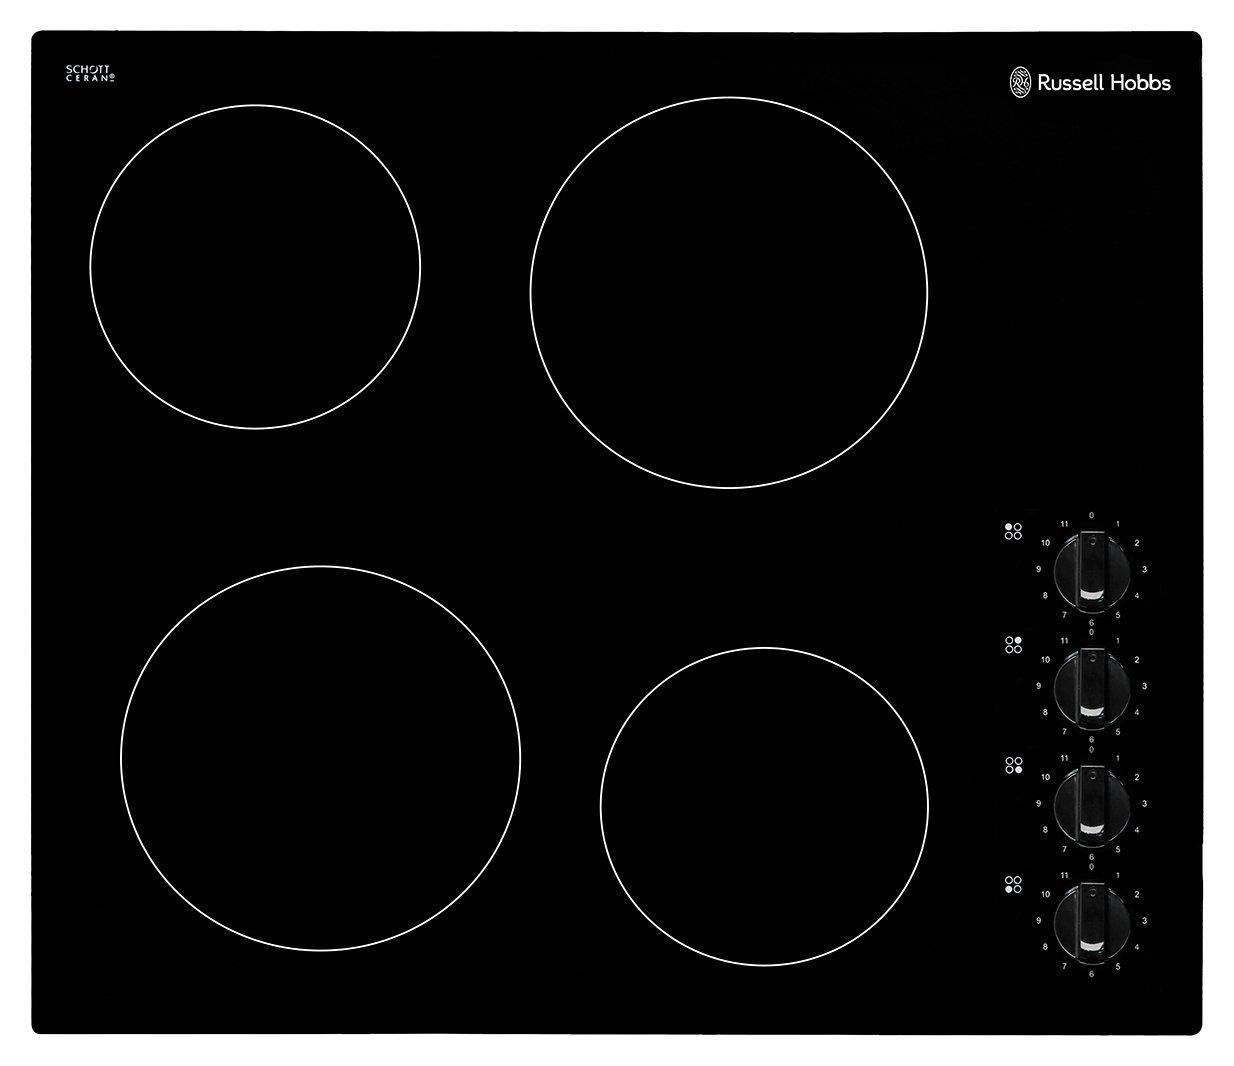 Russell Hobbs RH60EH502B Electric Ceramic Hob - Black